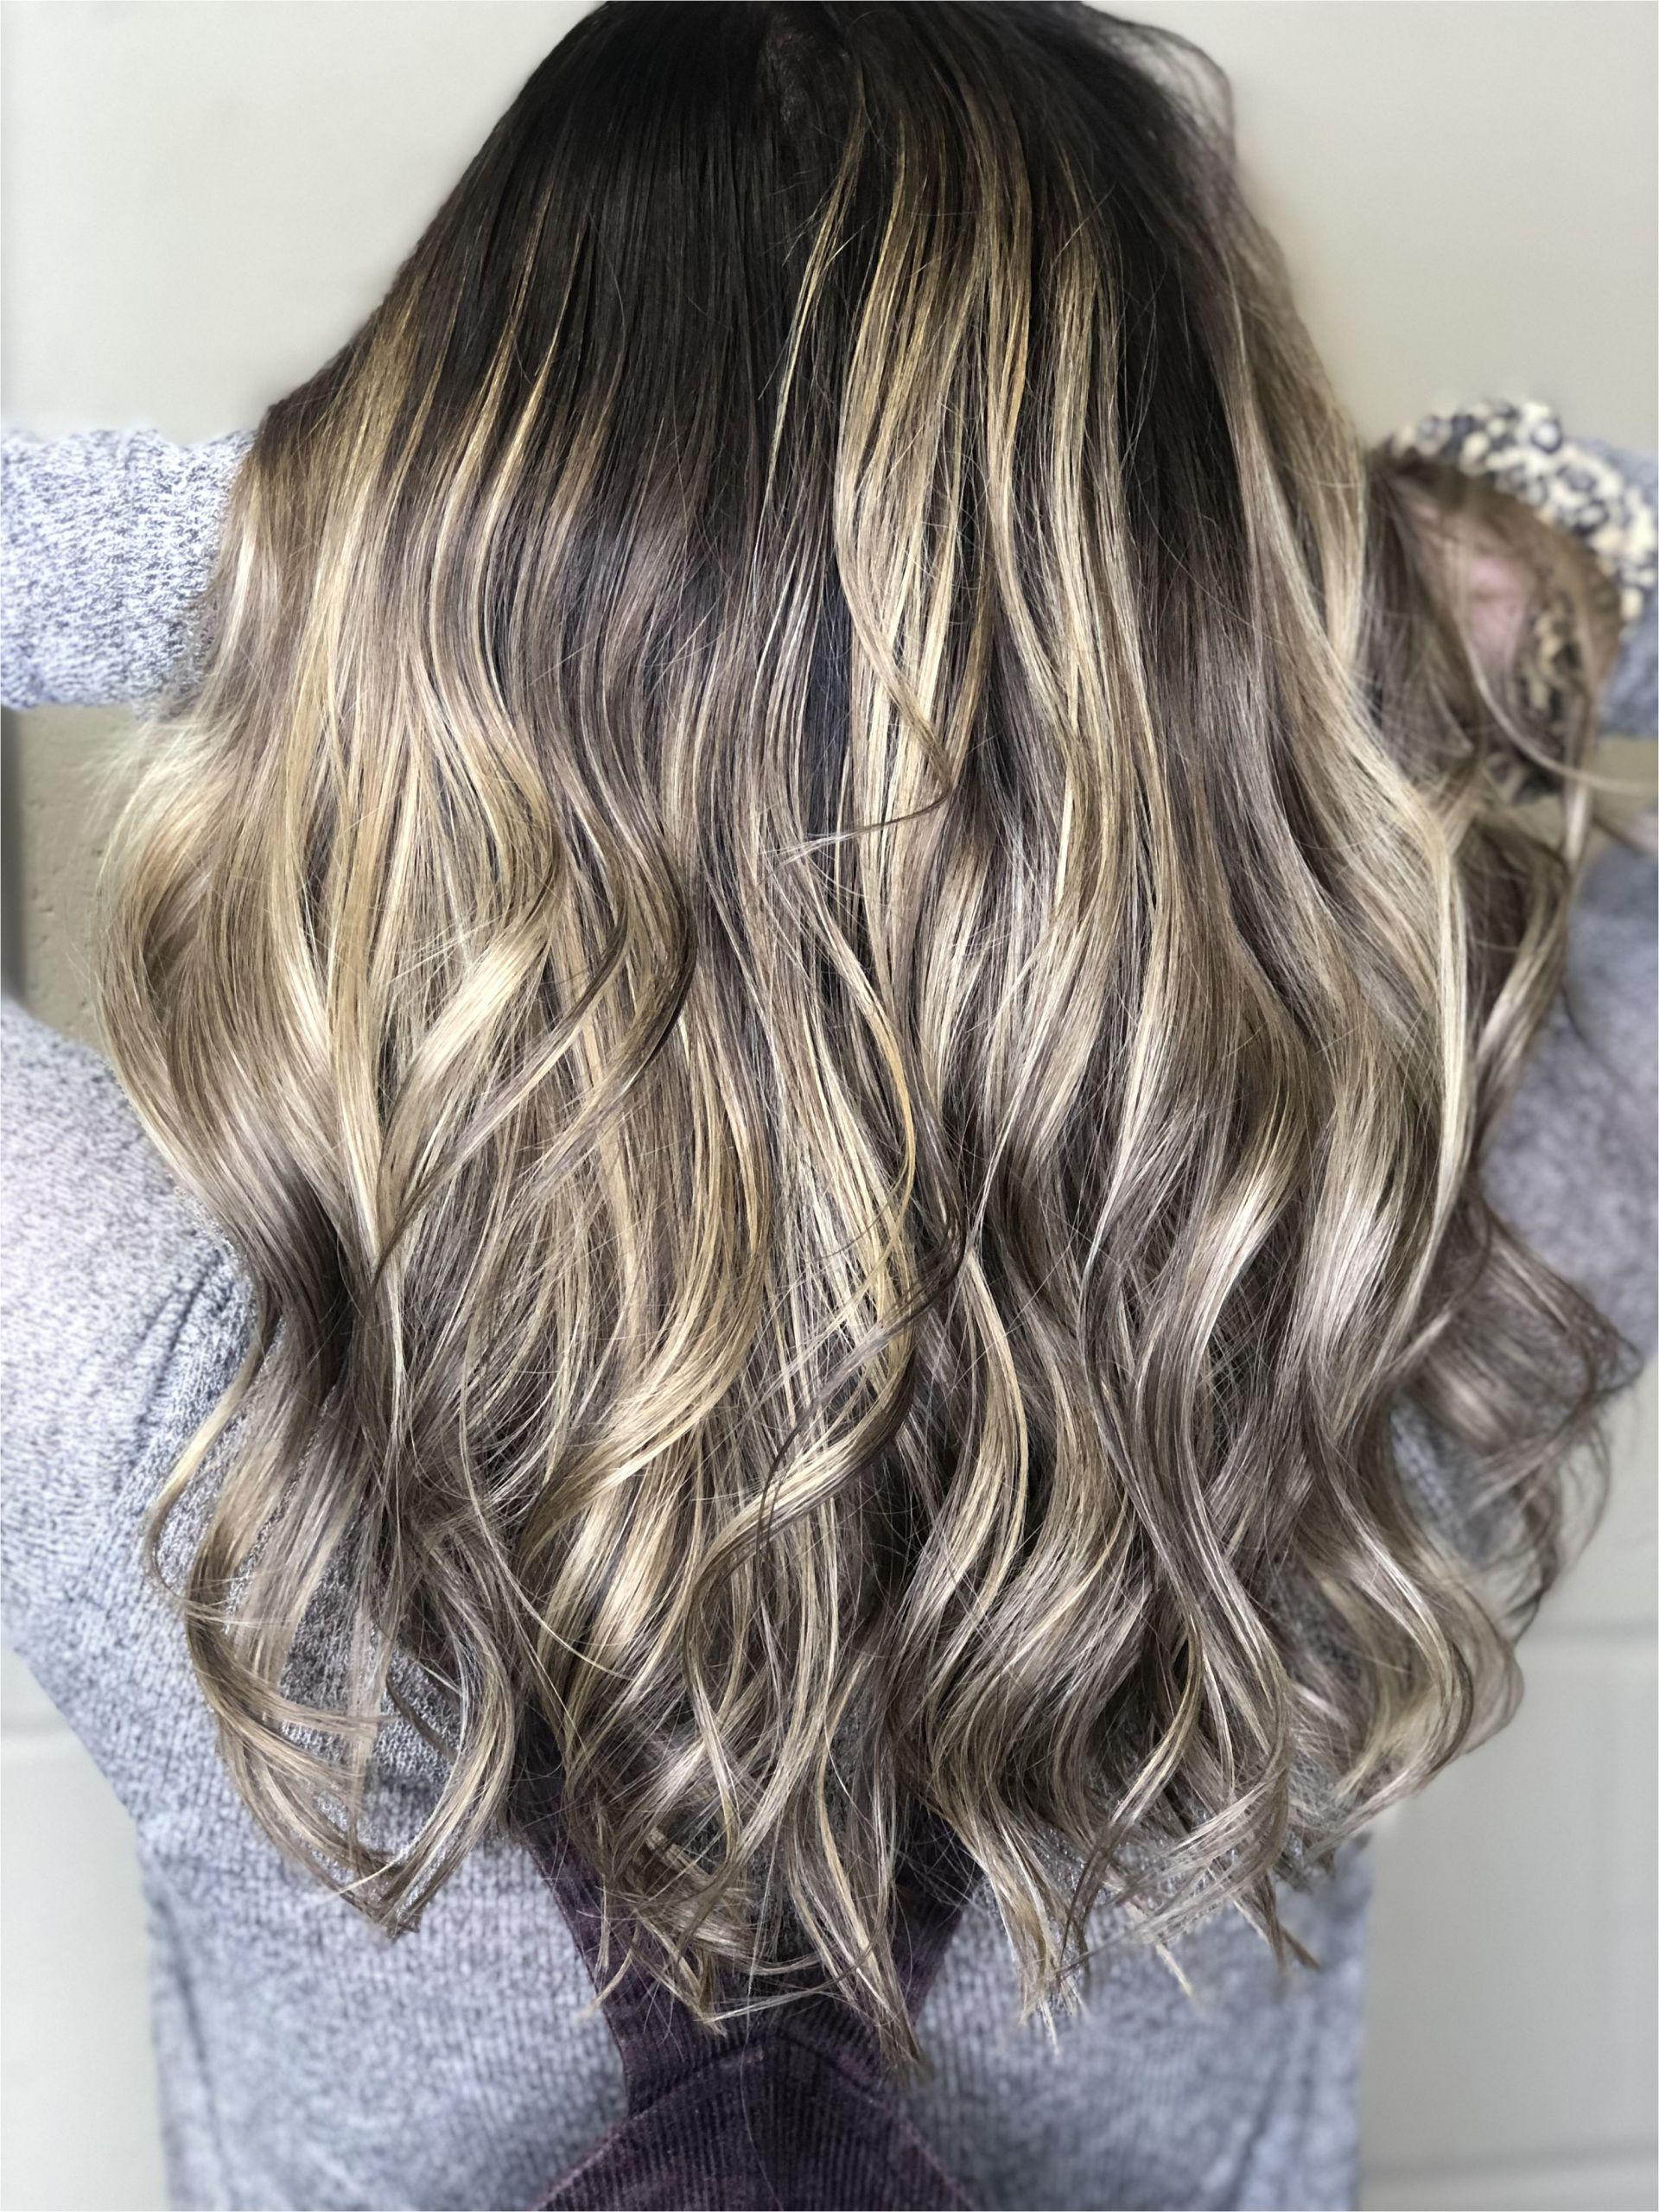 balayage hair pics inspirational hairstyles balayage short hair blonde scenic hair color balayage photos of balayage hair pics jpg